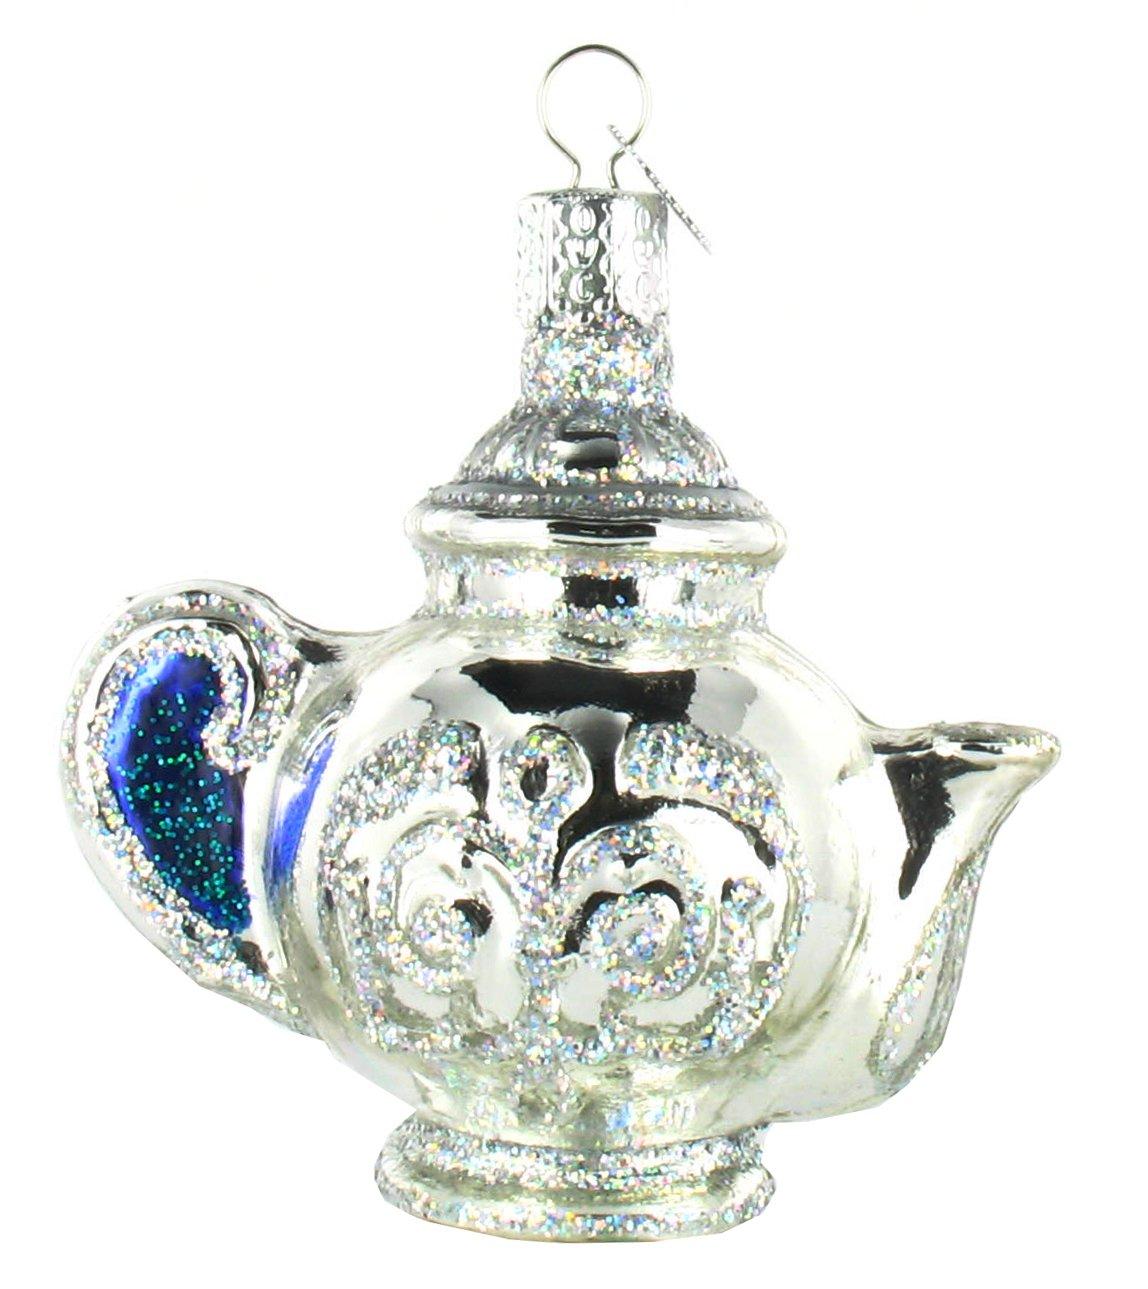 Amazon.com: Old World Christmas Teapot Glass Ornament: Home & Kitchen